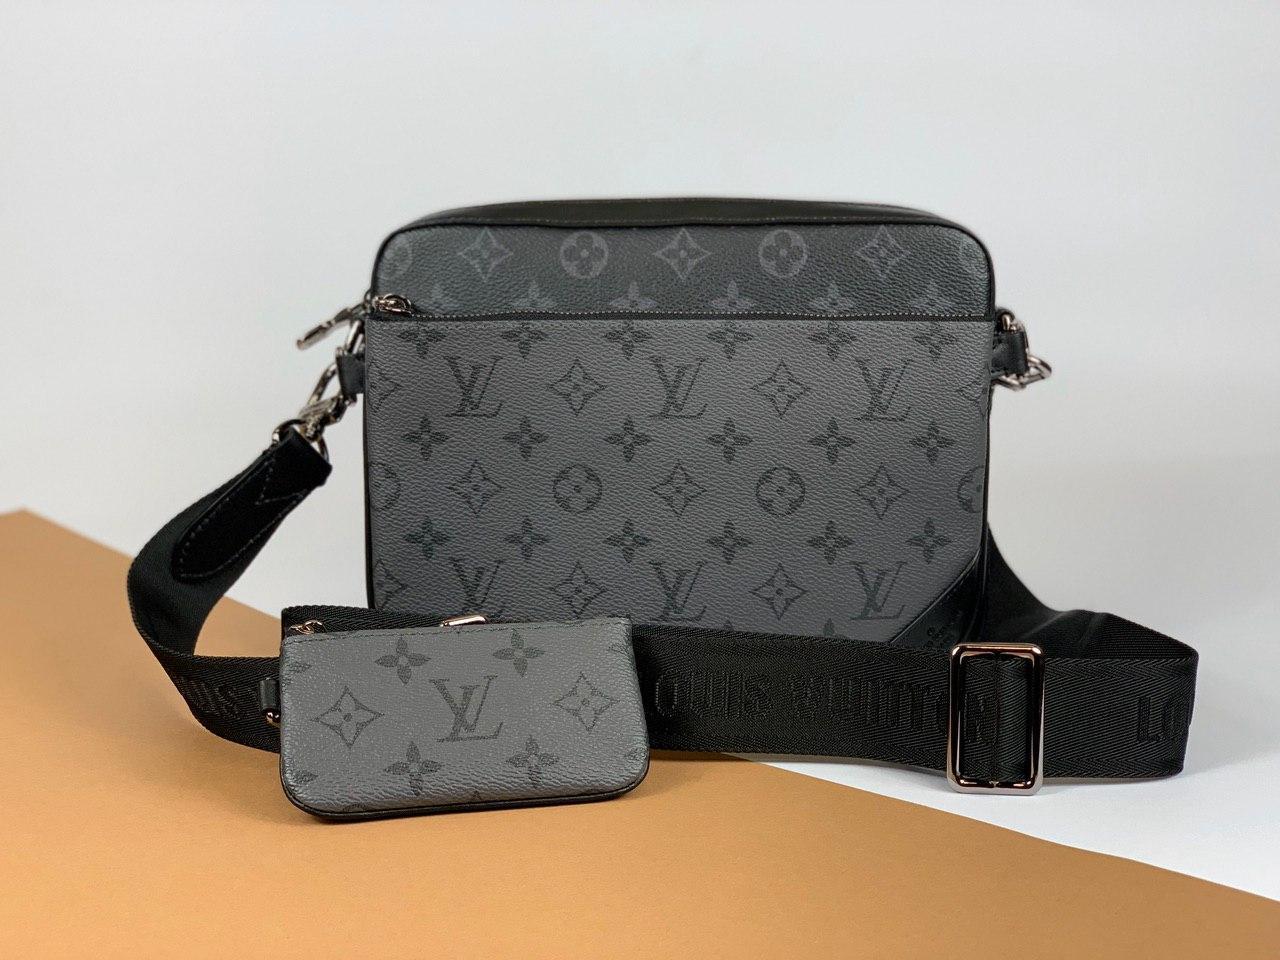 Мужская сумка через плечо Louis Vuitton (Луи Виттон) арт. 14-226